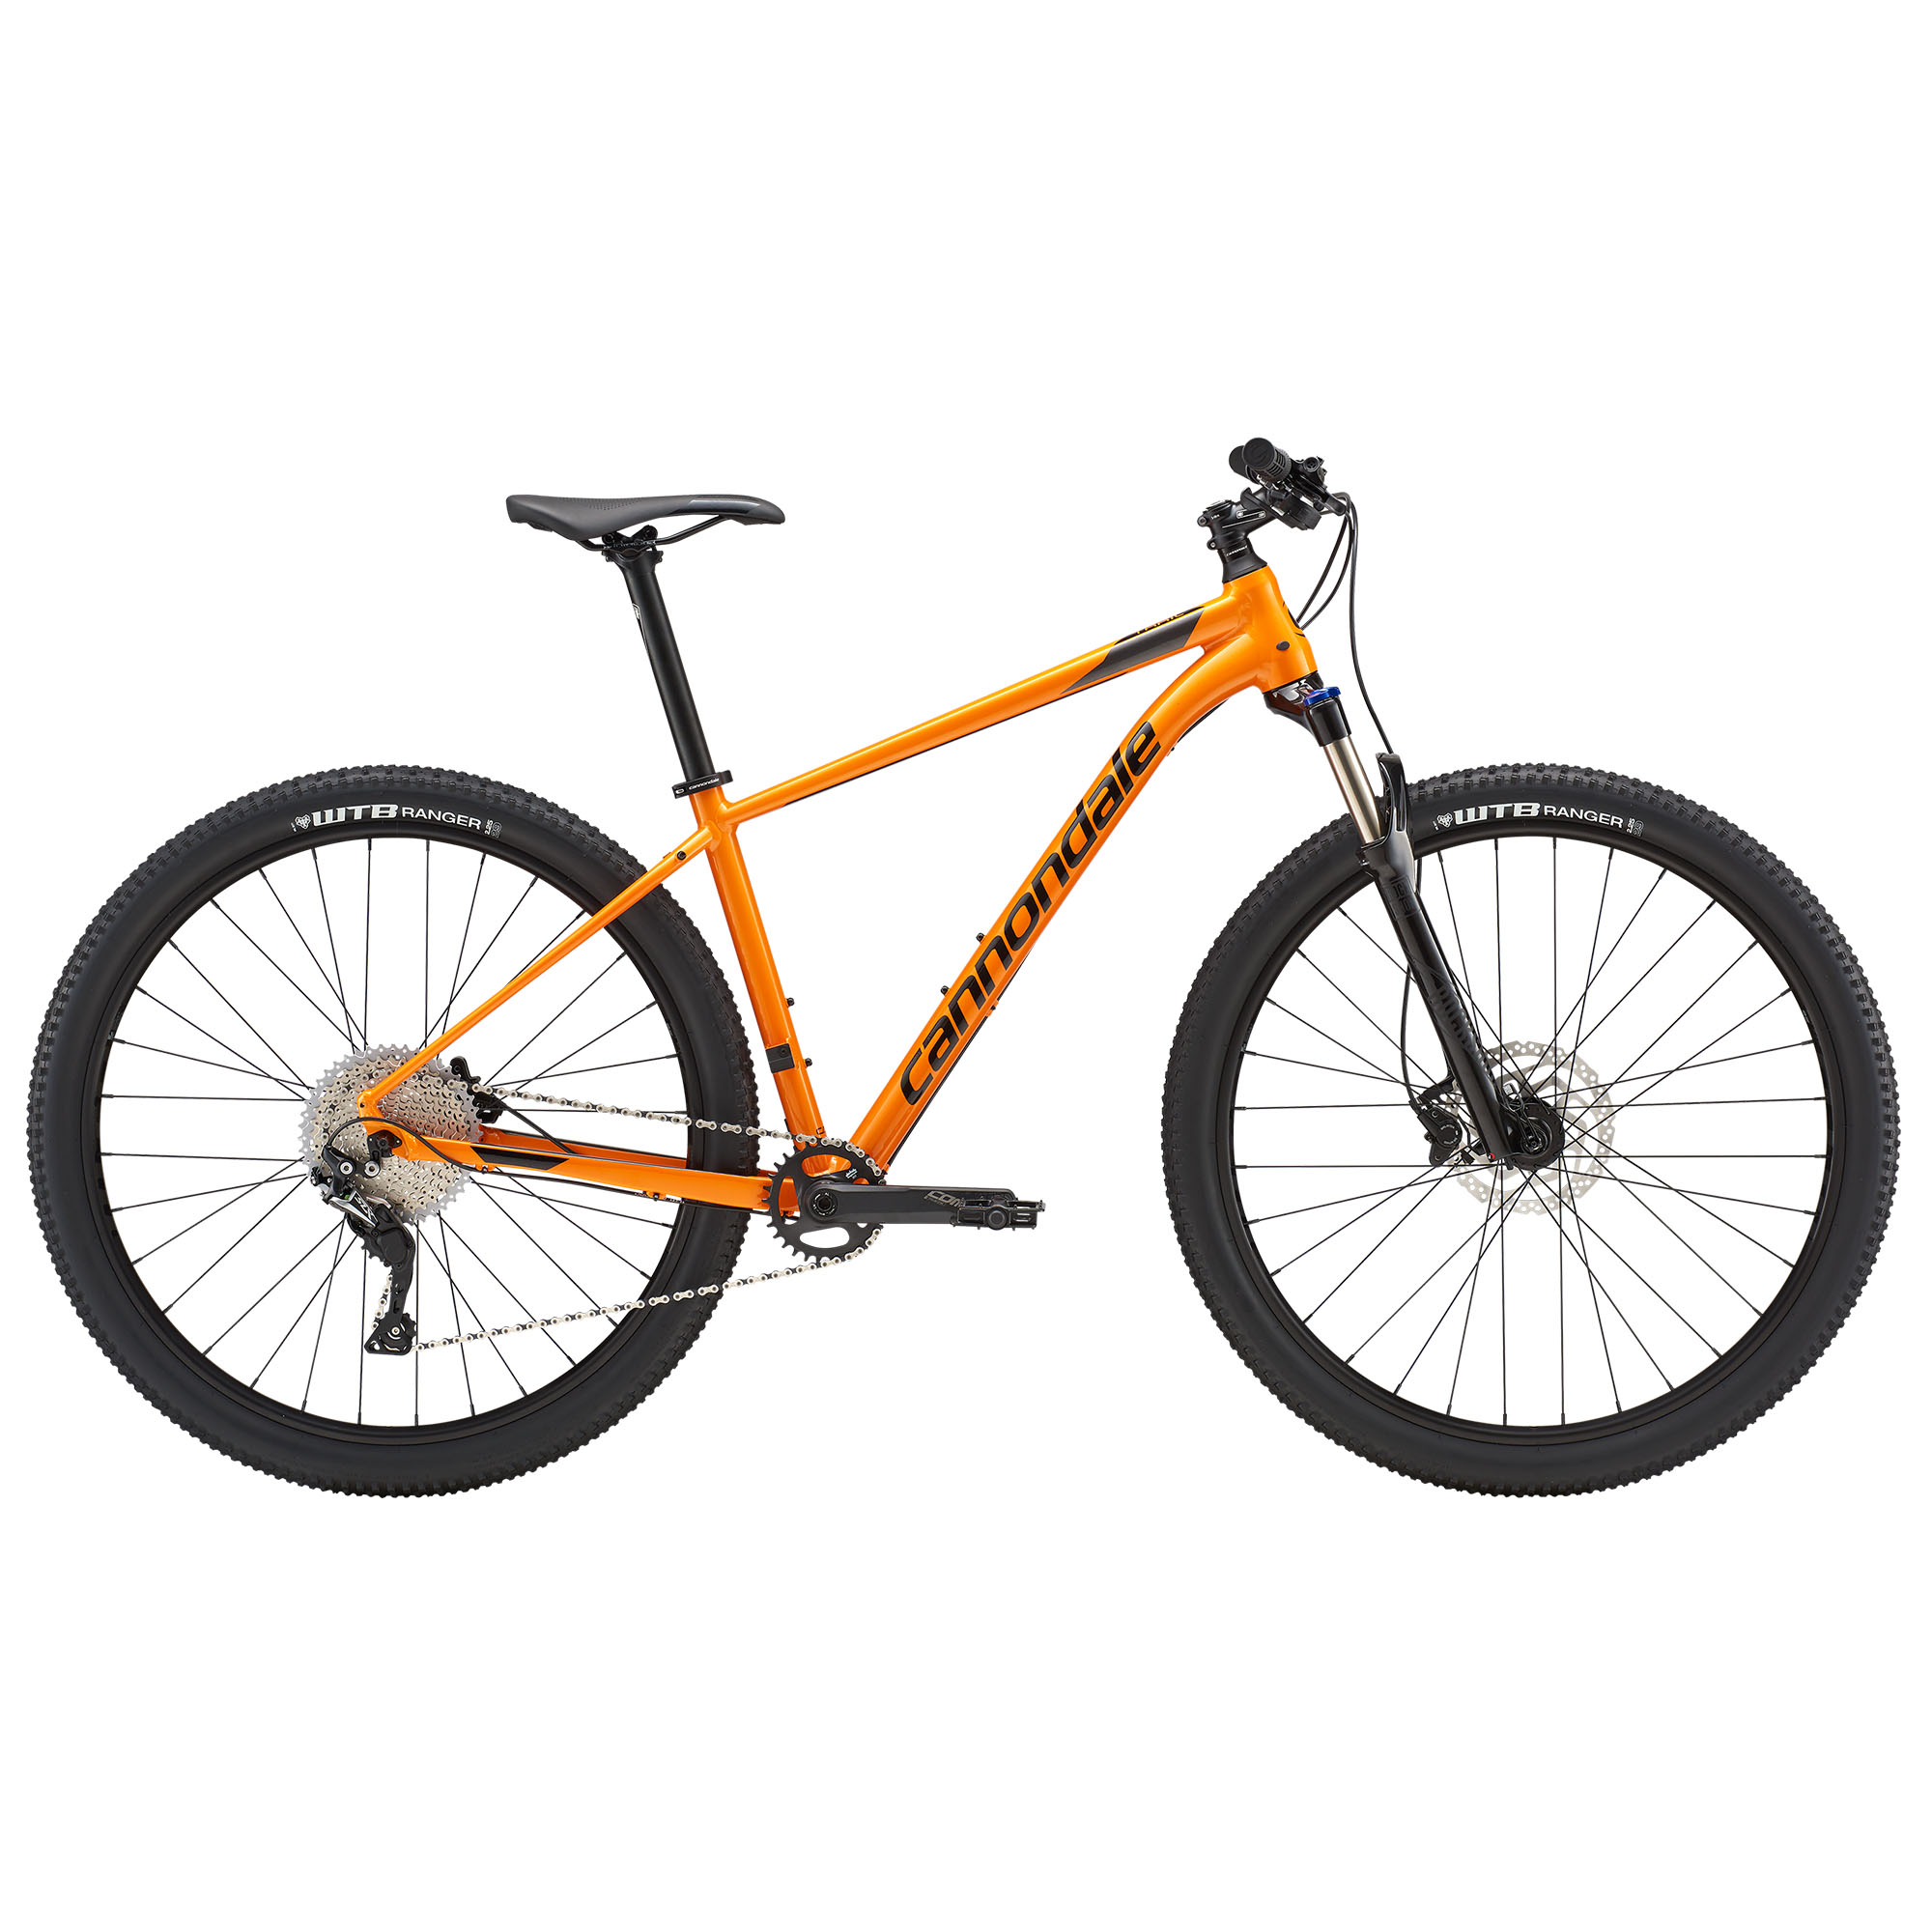 cannondale men u0026 39 s trail 3 mountain bike  u0026 39 19